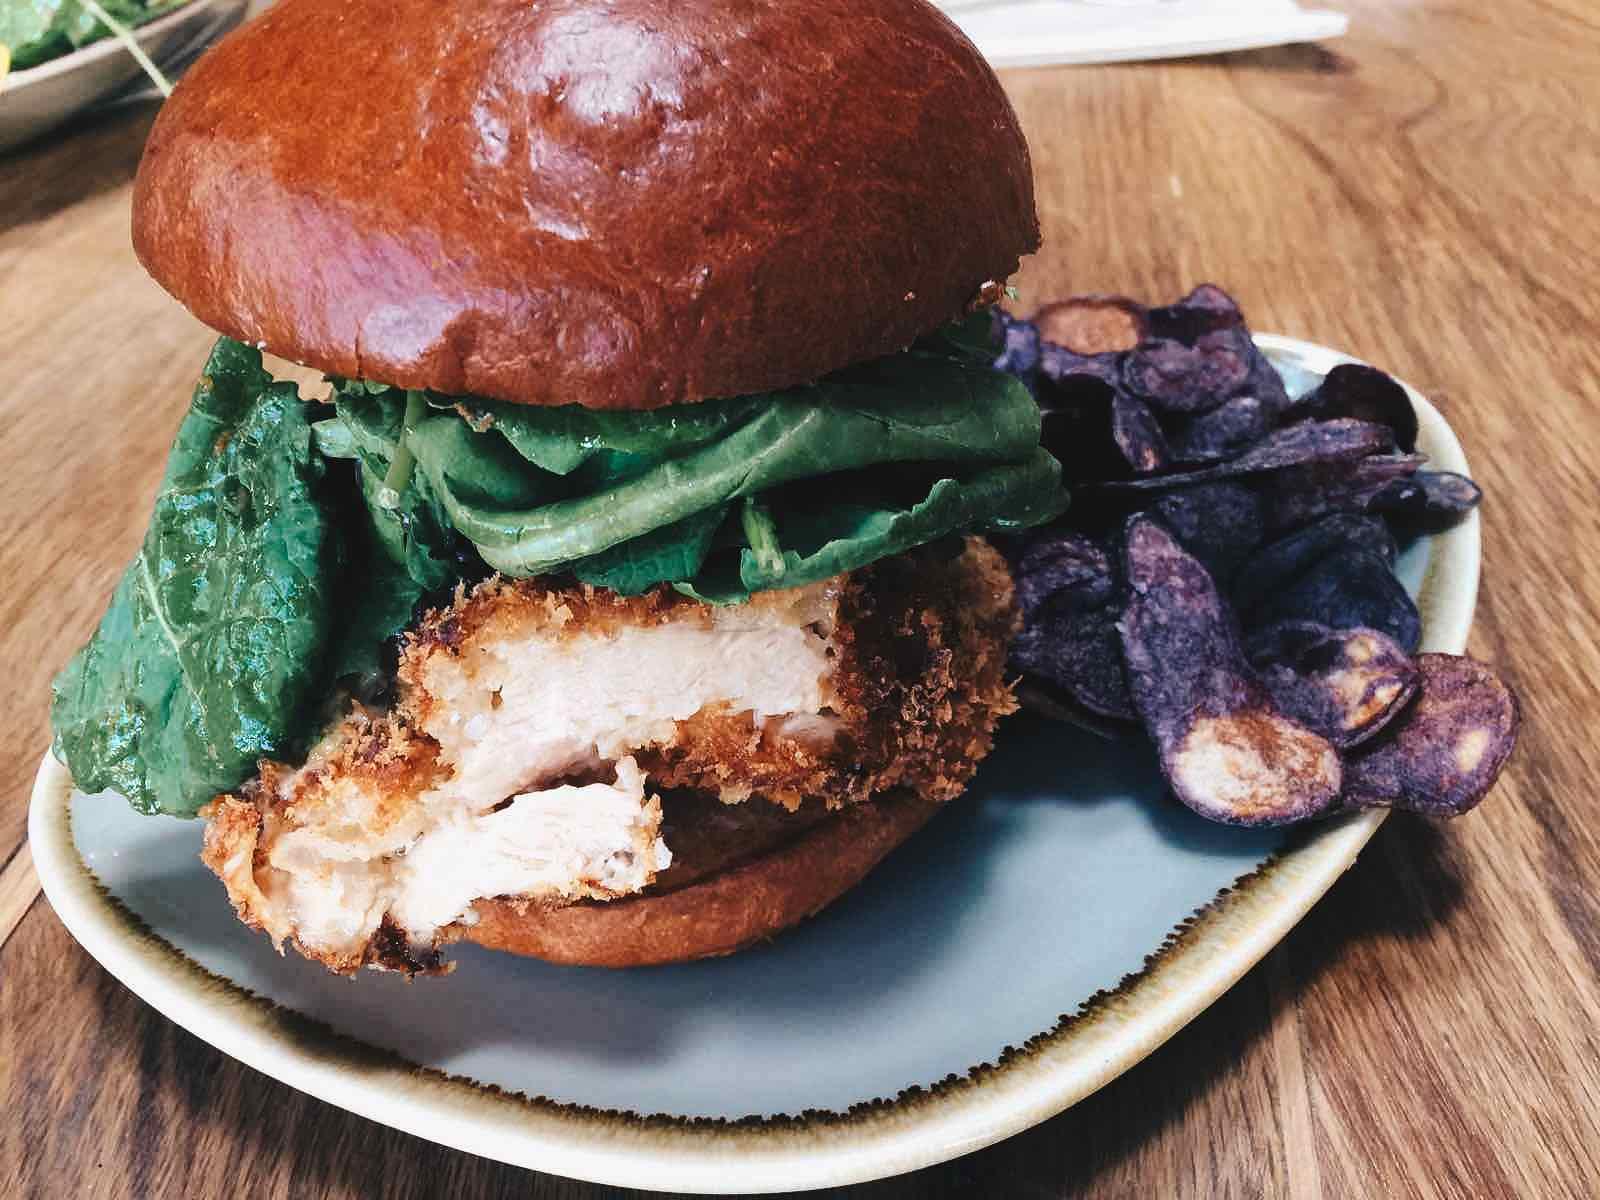 pono-burger-west-hollywood-1.jpg